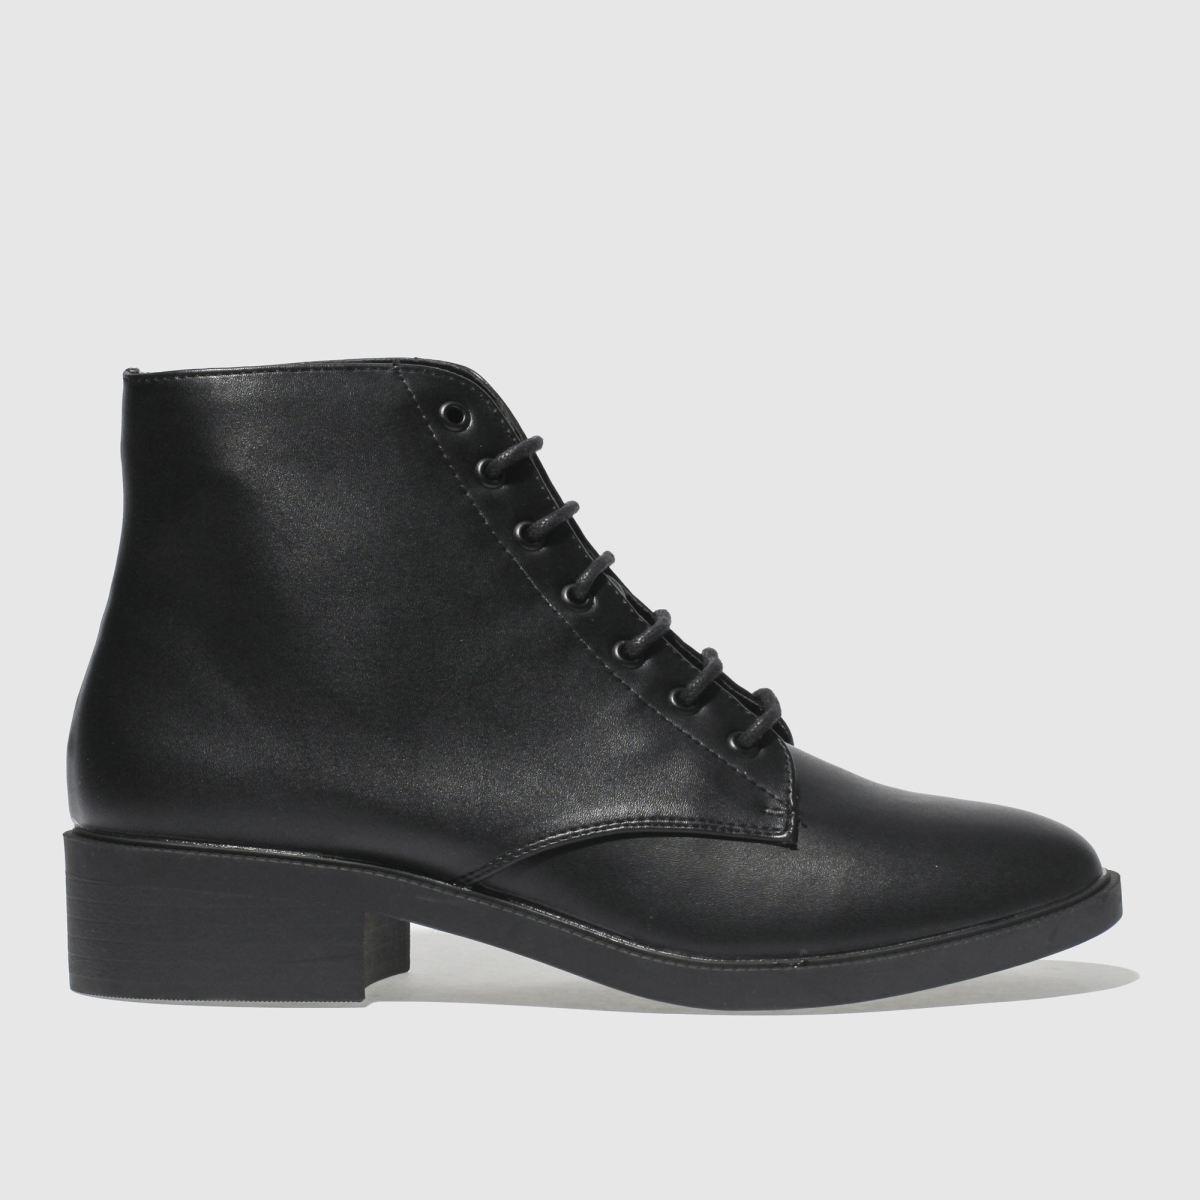 Schuh Black Arizona Boots